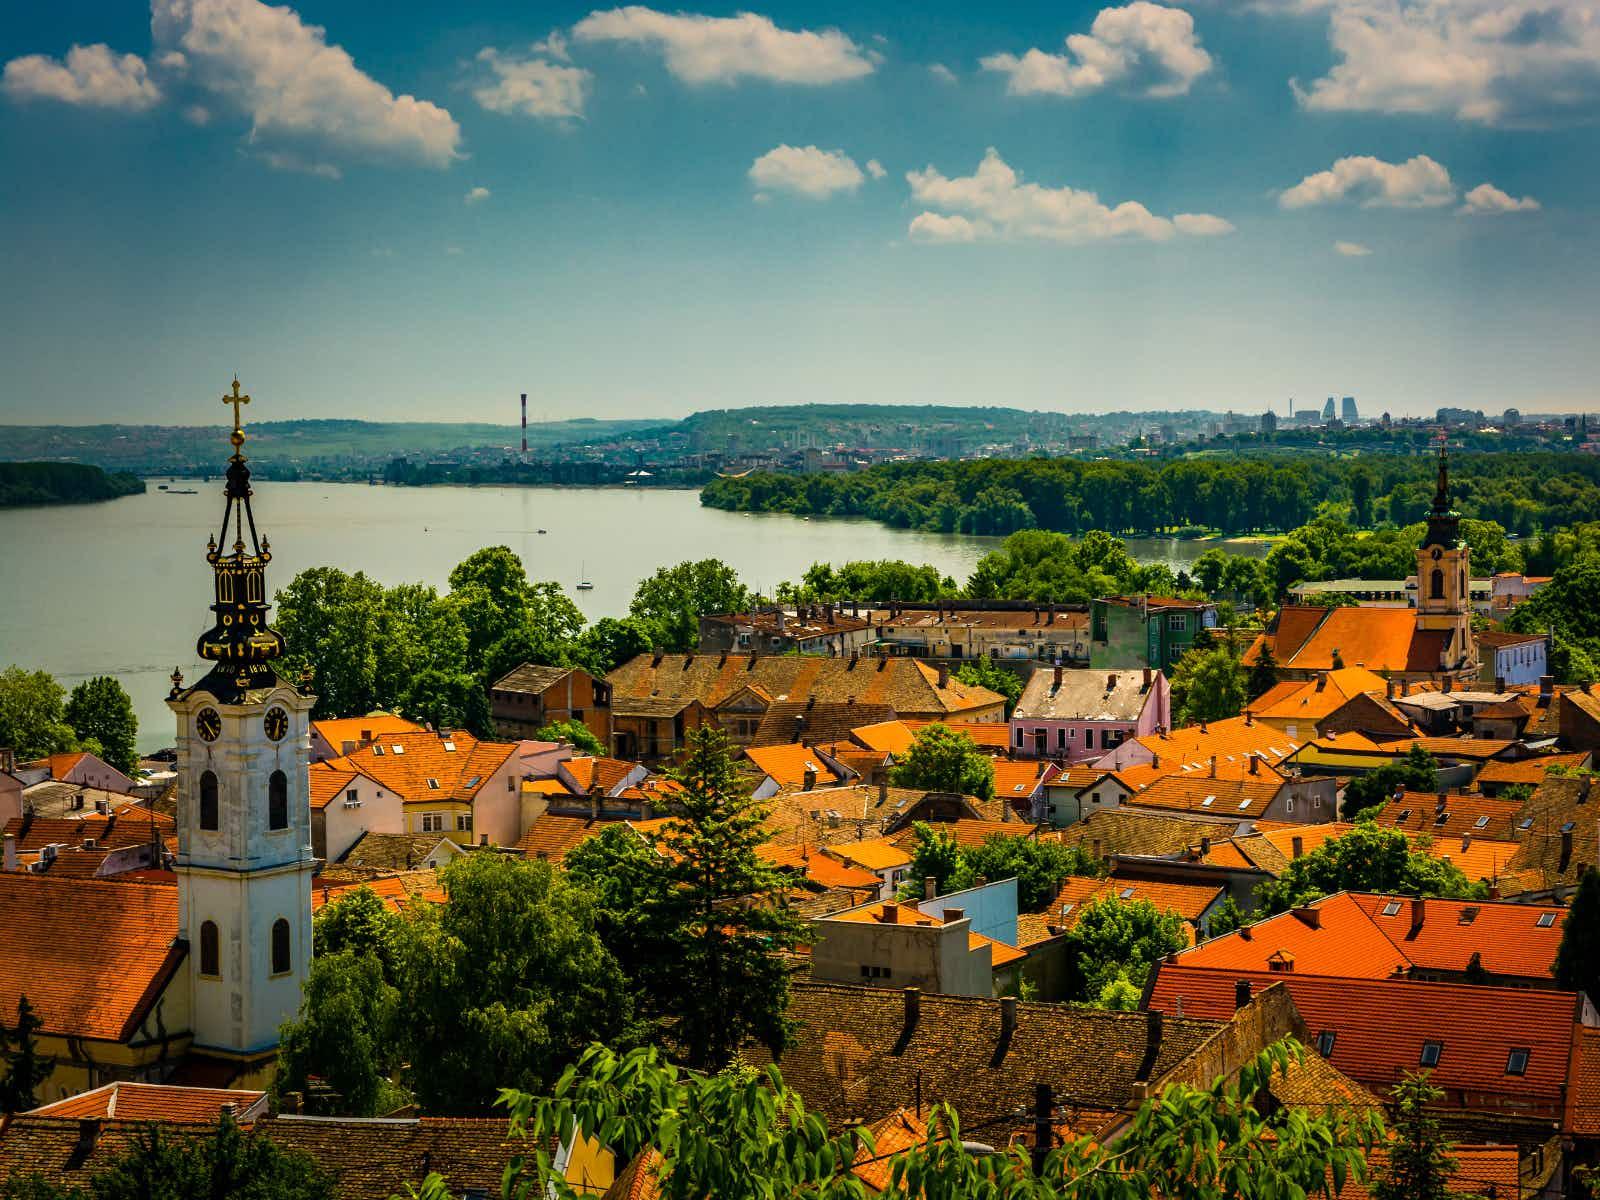 View over Zemun's quaint rooftops and the Danube from Gardoš Tower ©Evgeni Fabisuk/ Shutterstock